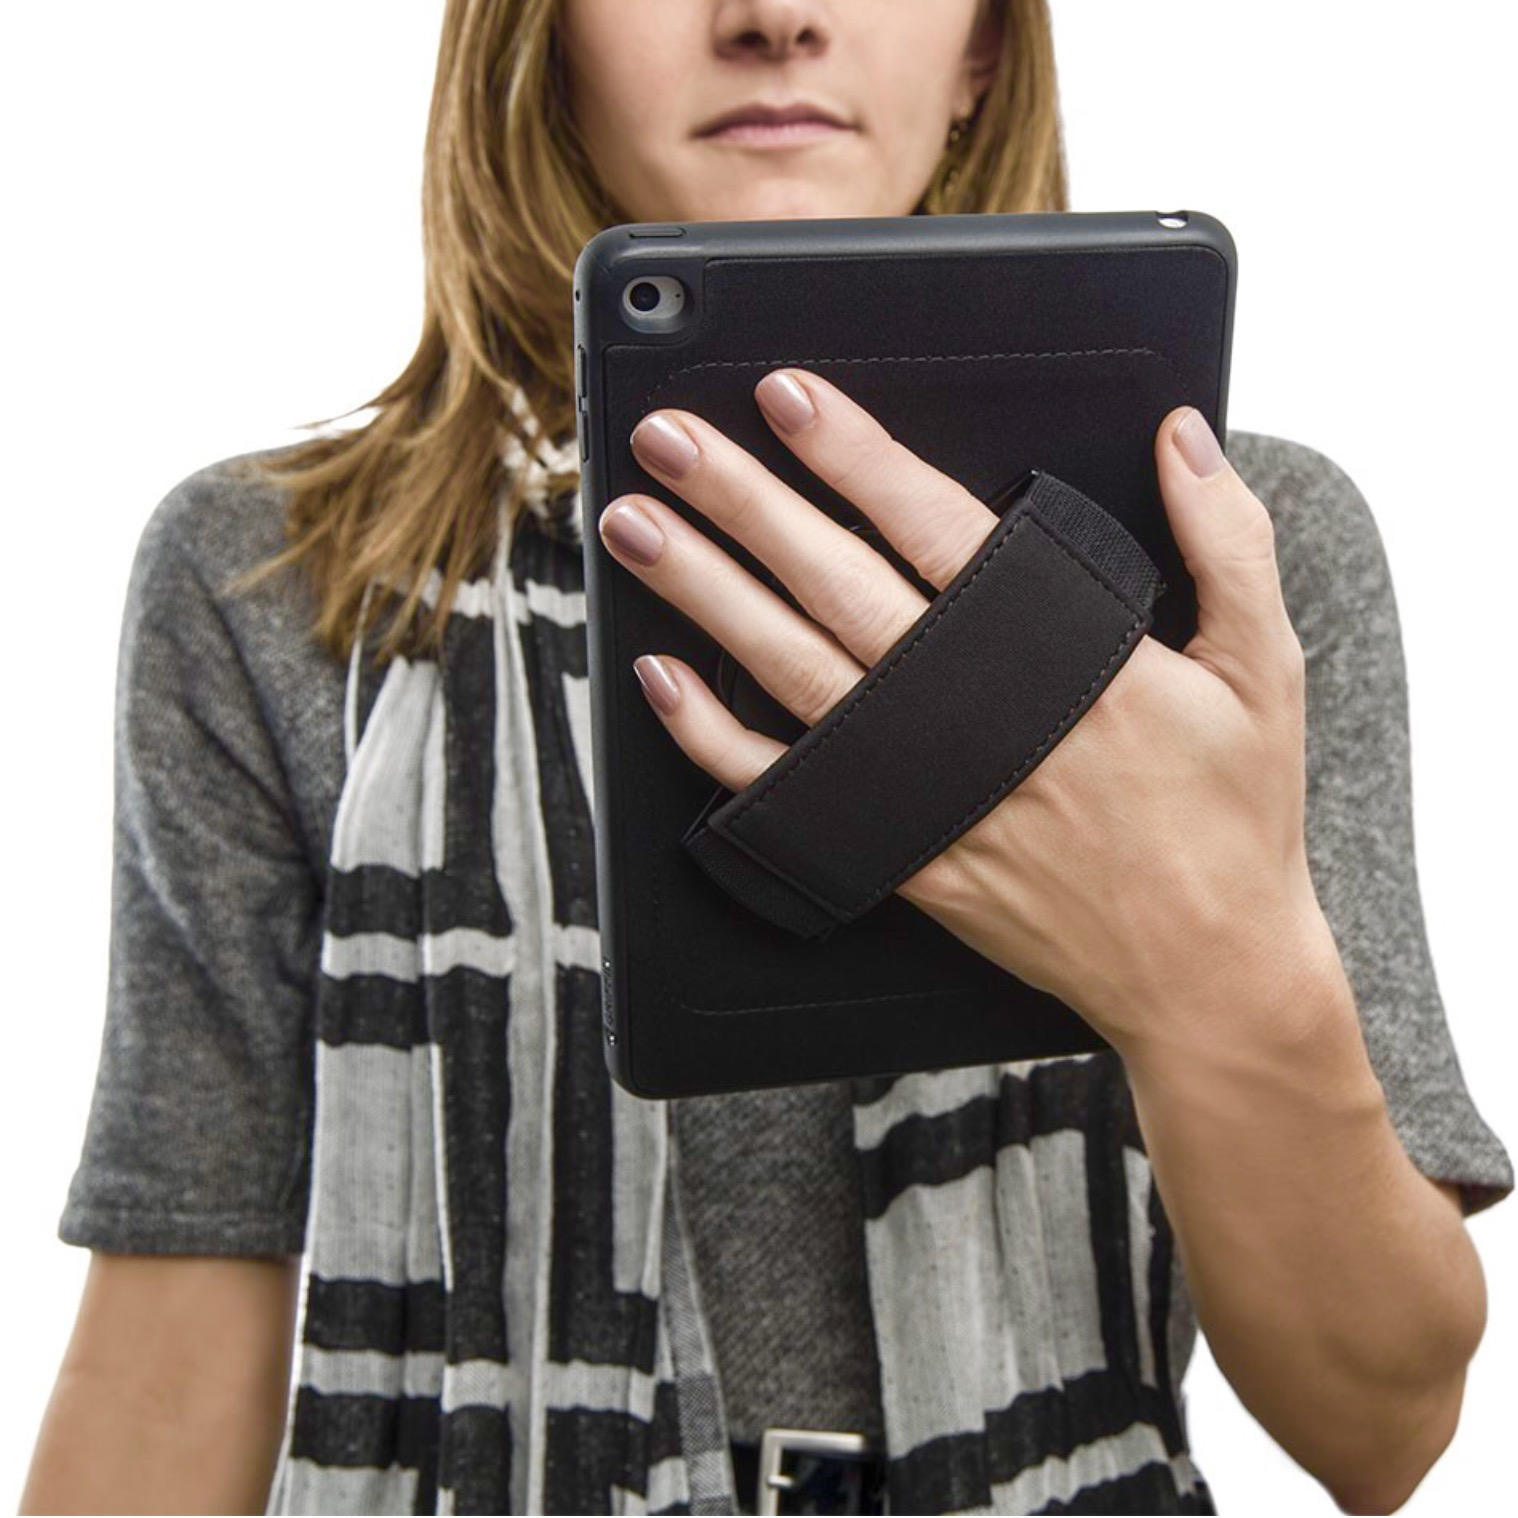 Coque Protection Rotative iPad Mini 4 Airstrap Rotating 360